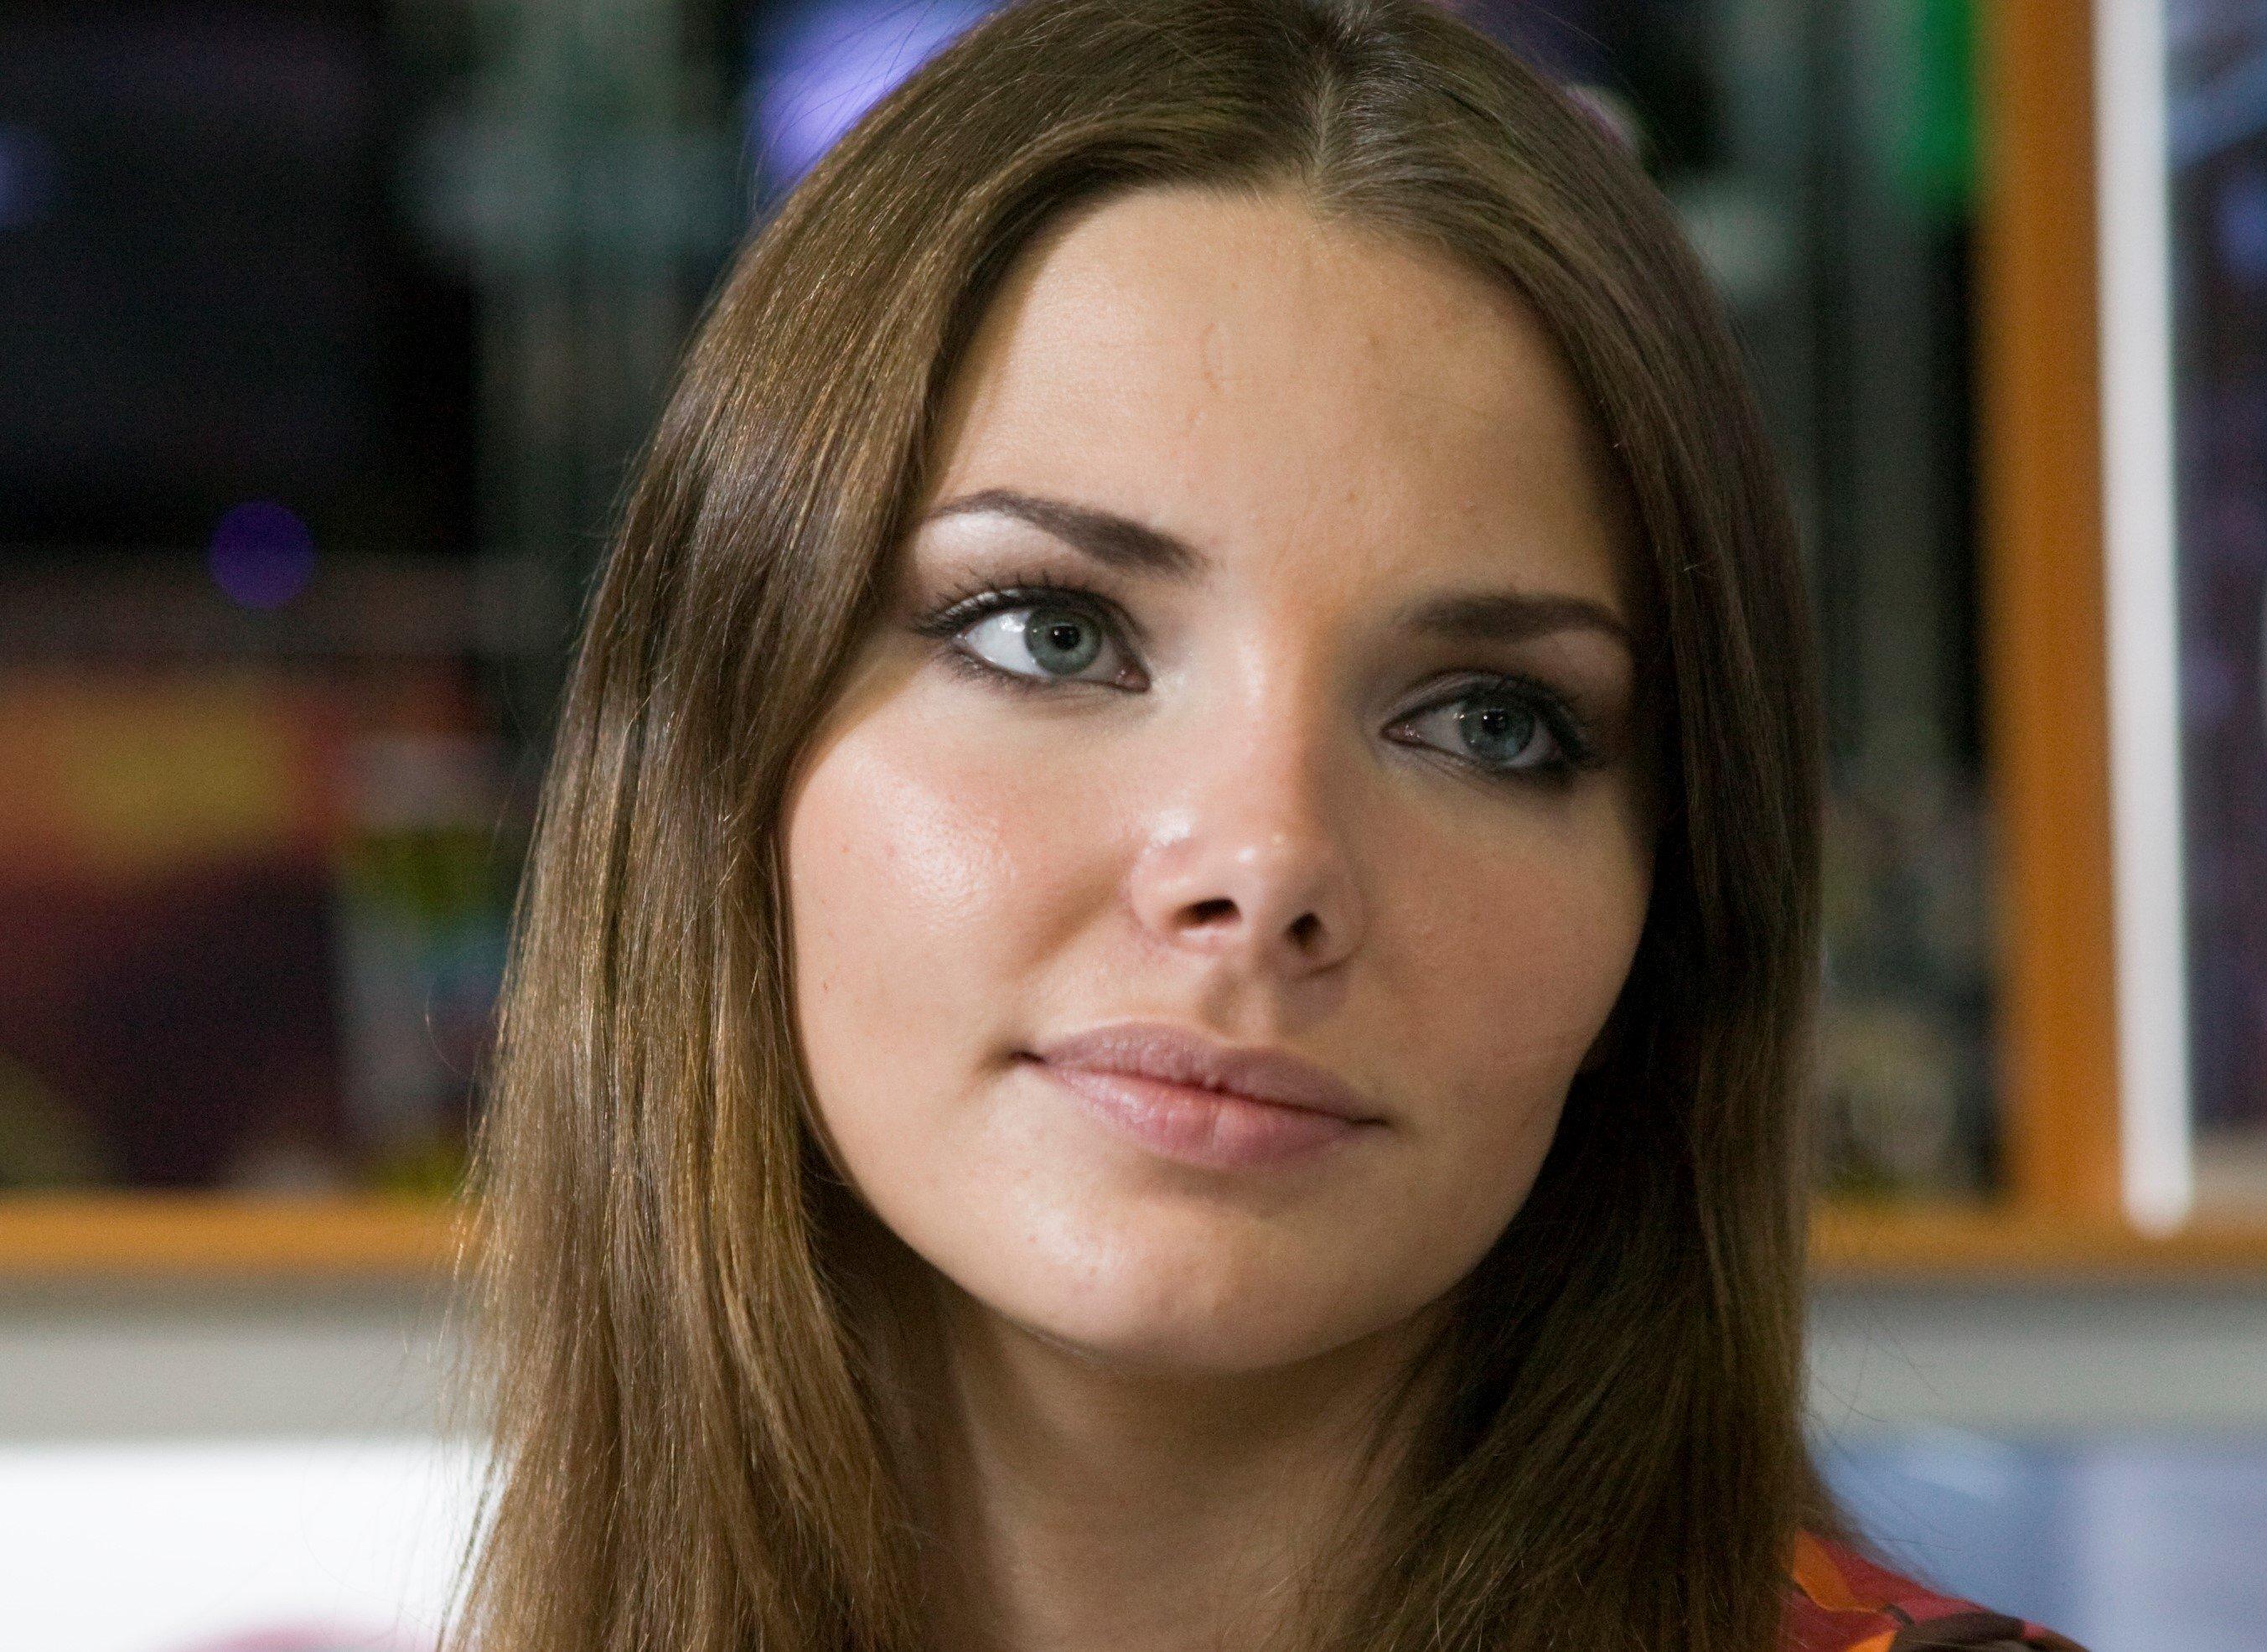 вот мне актриса елизавета боярская картинки самом